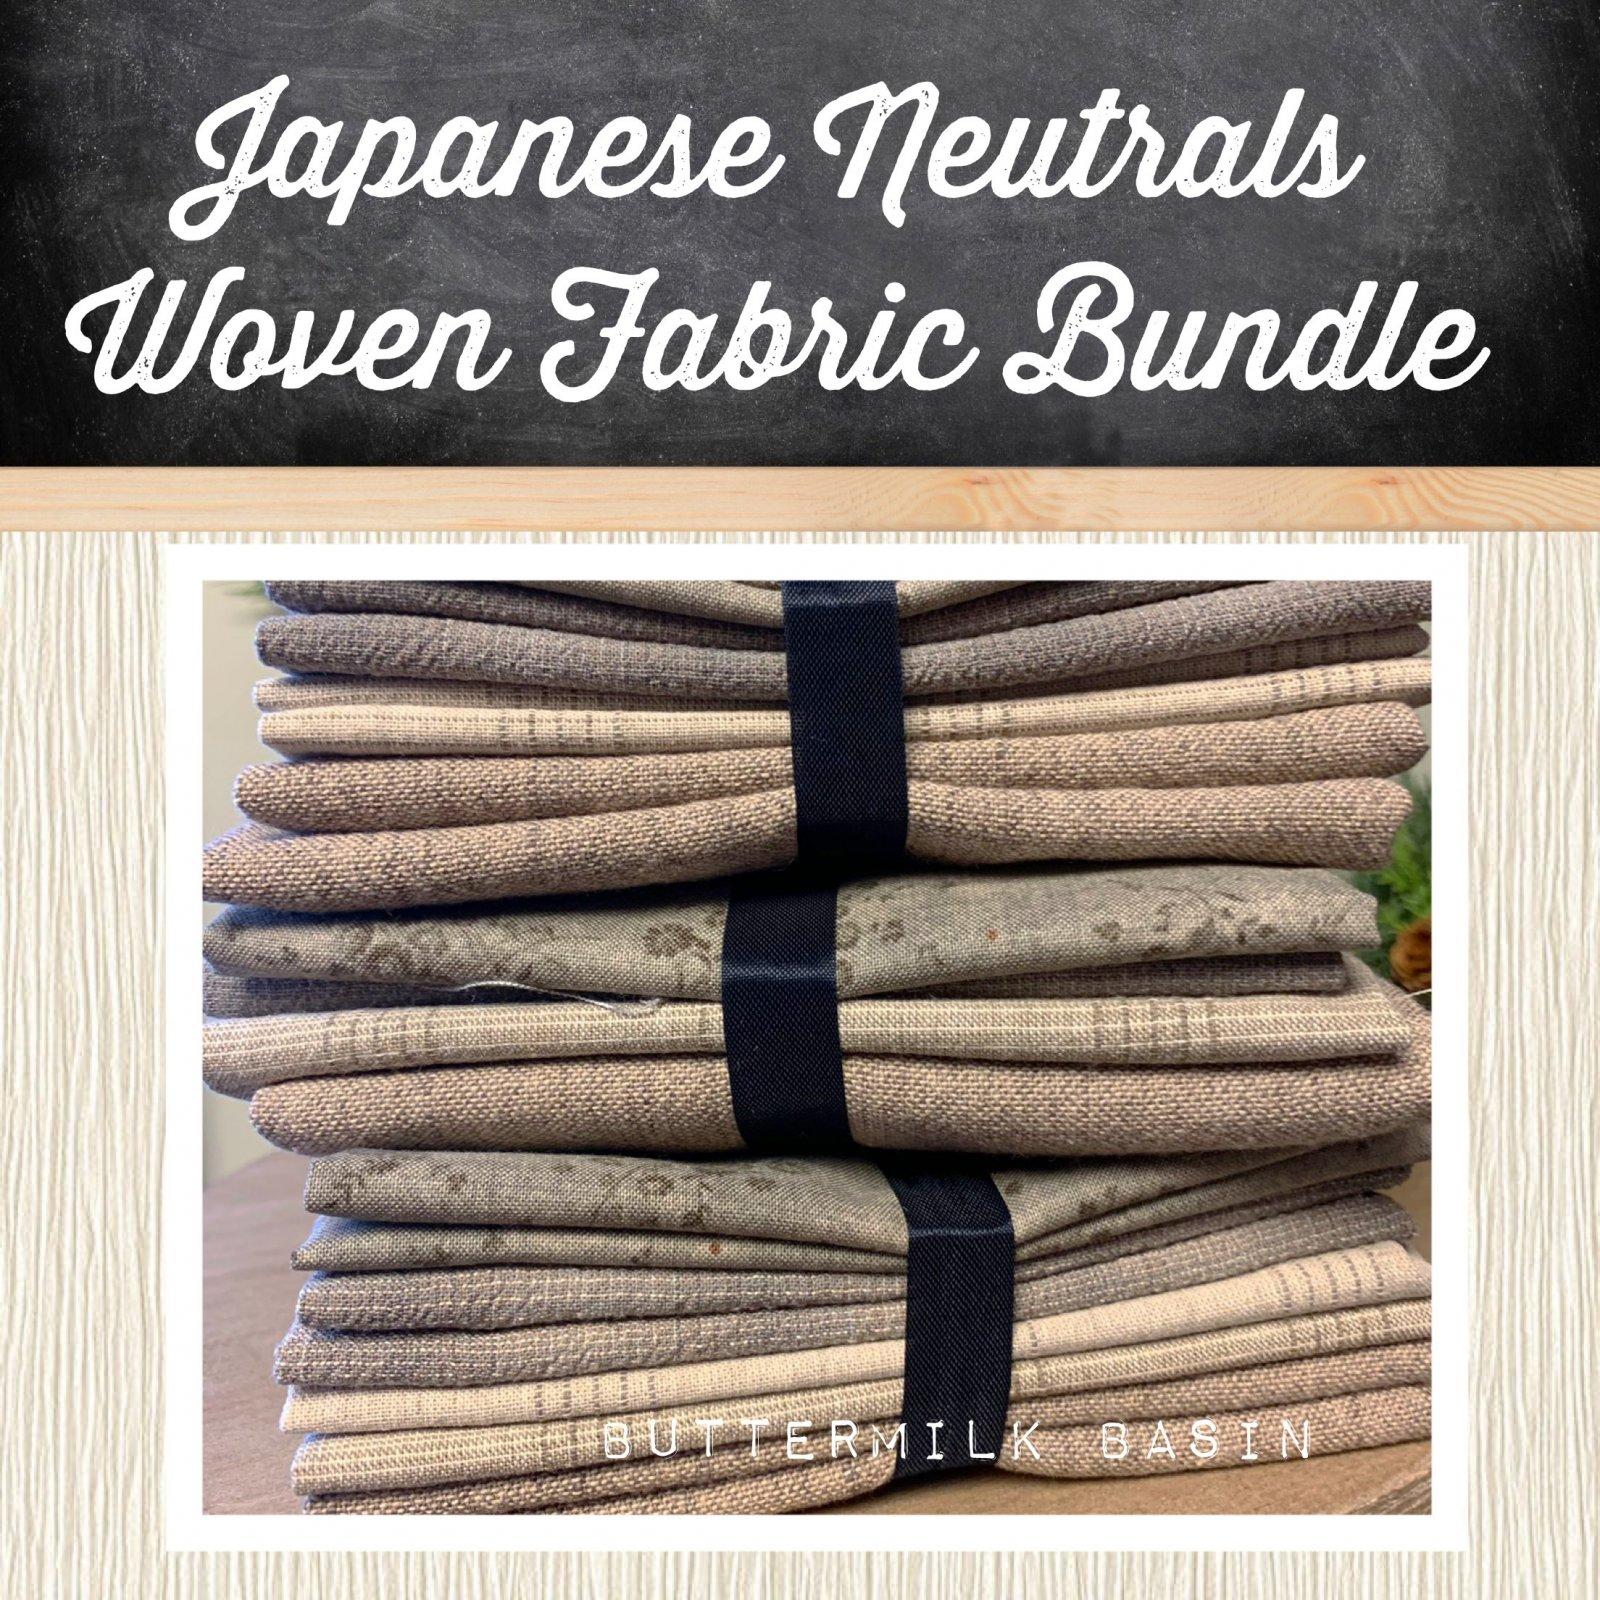 Japanese Neutrals Woven Fabric Bundle